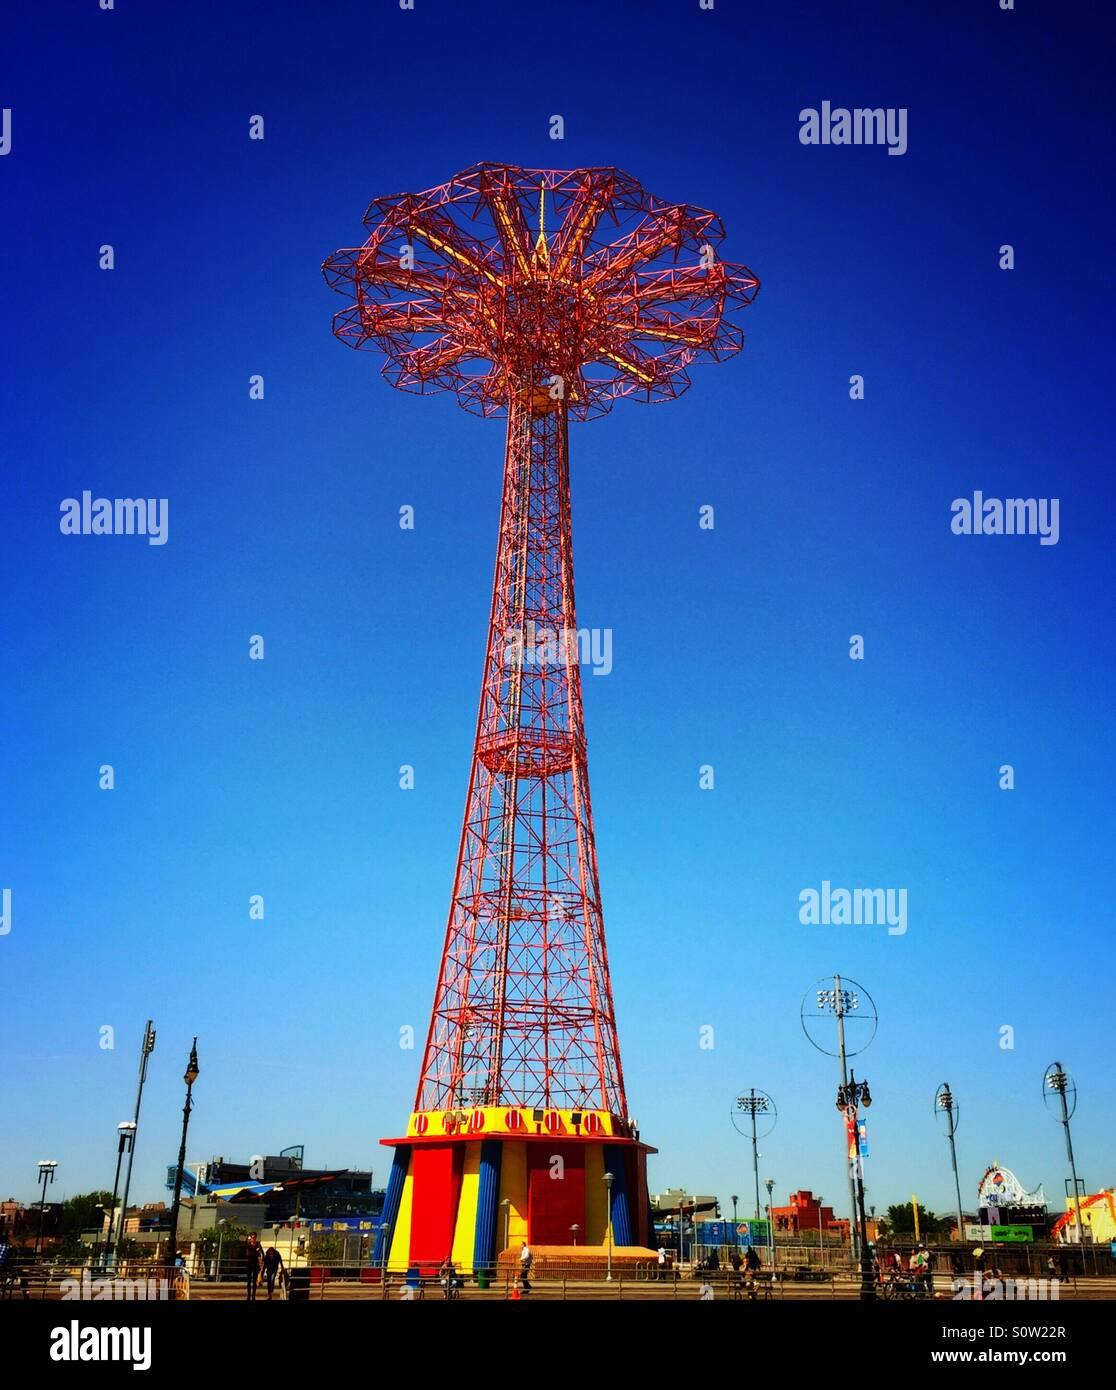 Parachute jump in Coney Island Brooklyn - Stock Image